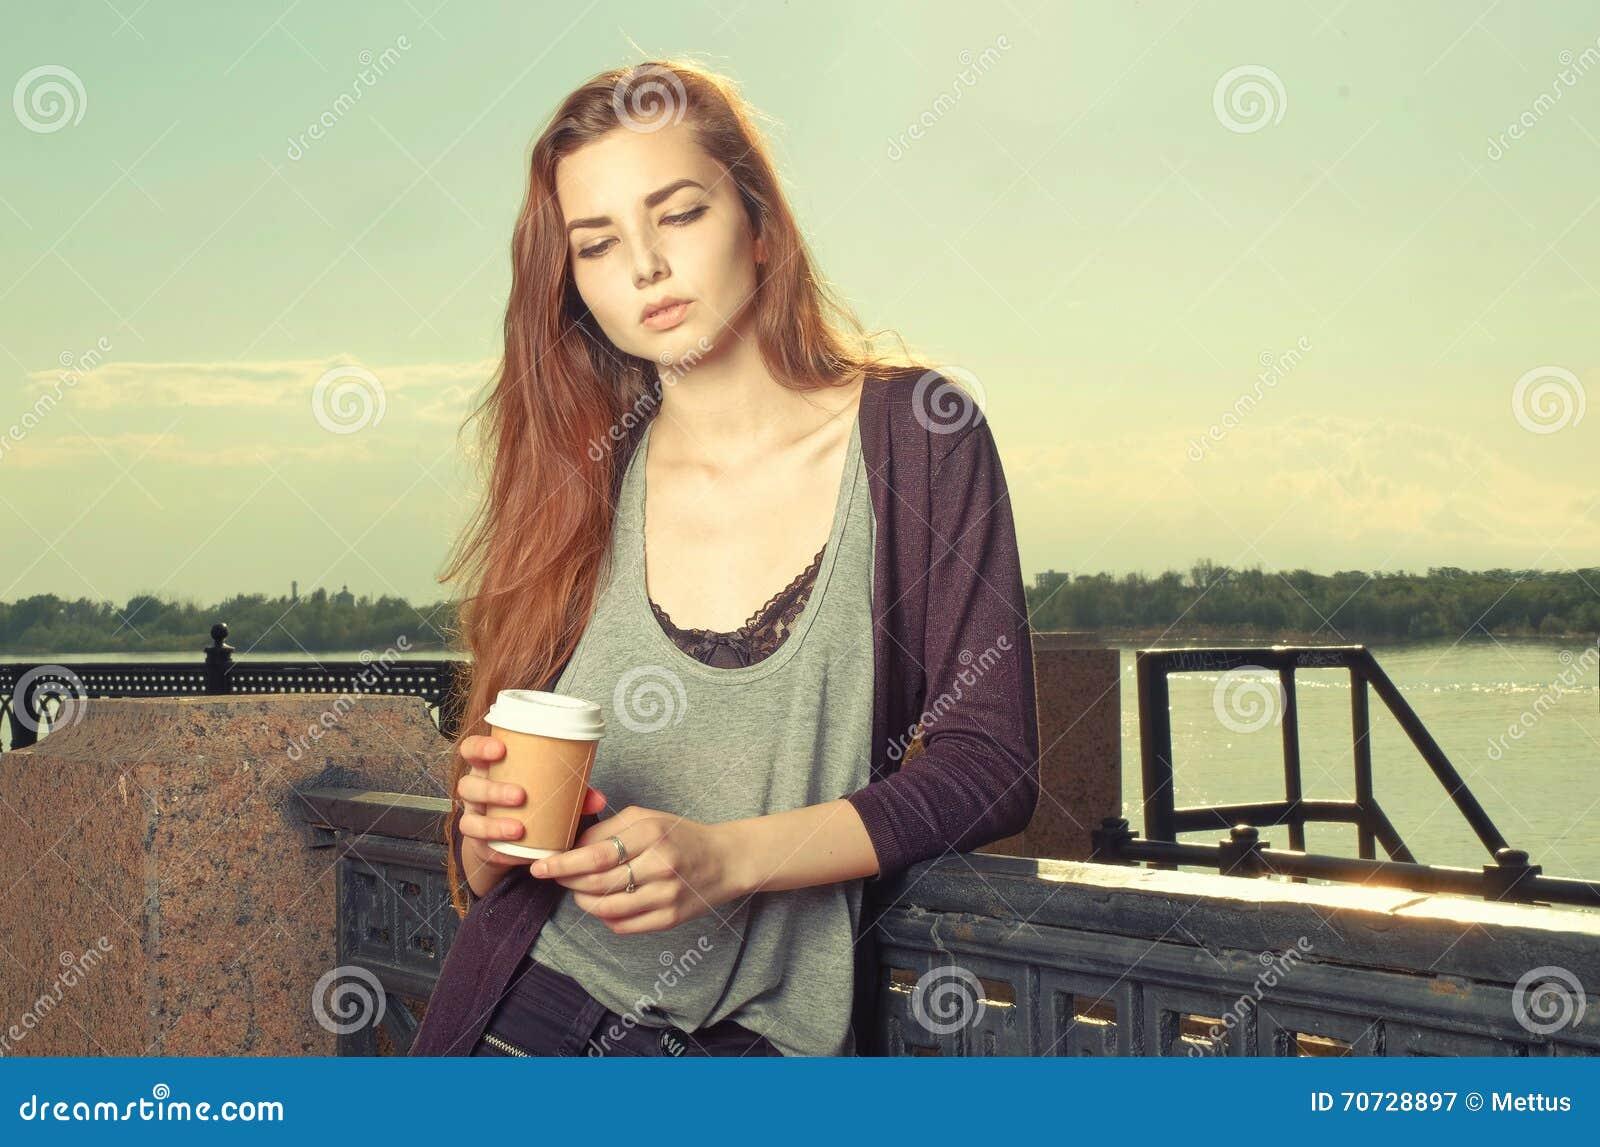 foto How to Look Like a Scene Teen